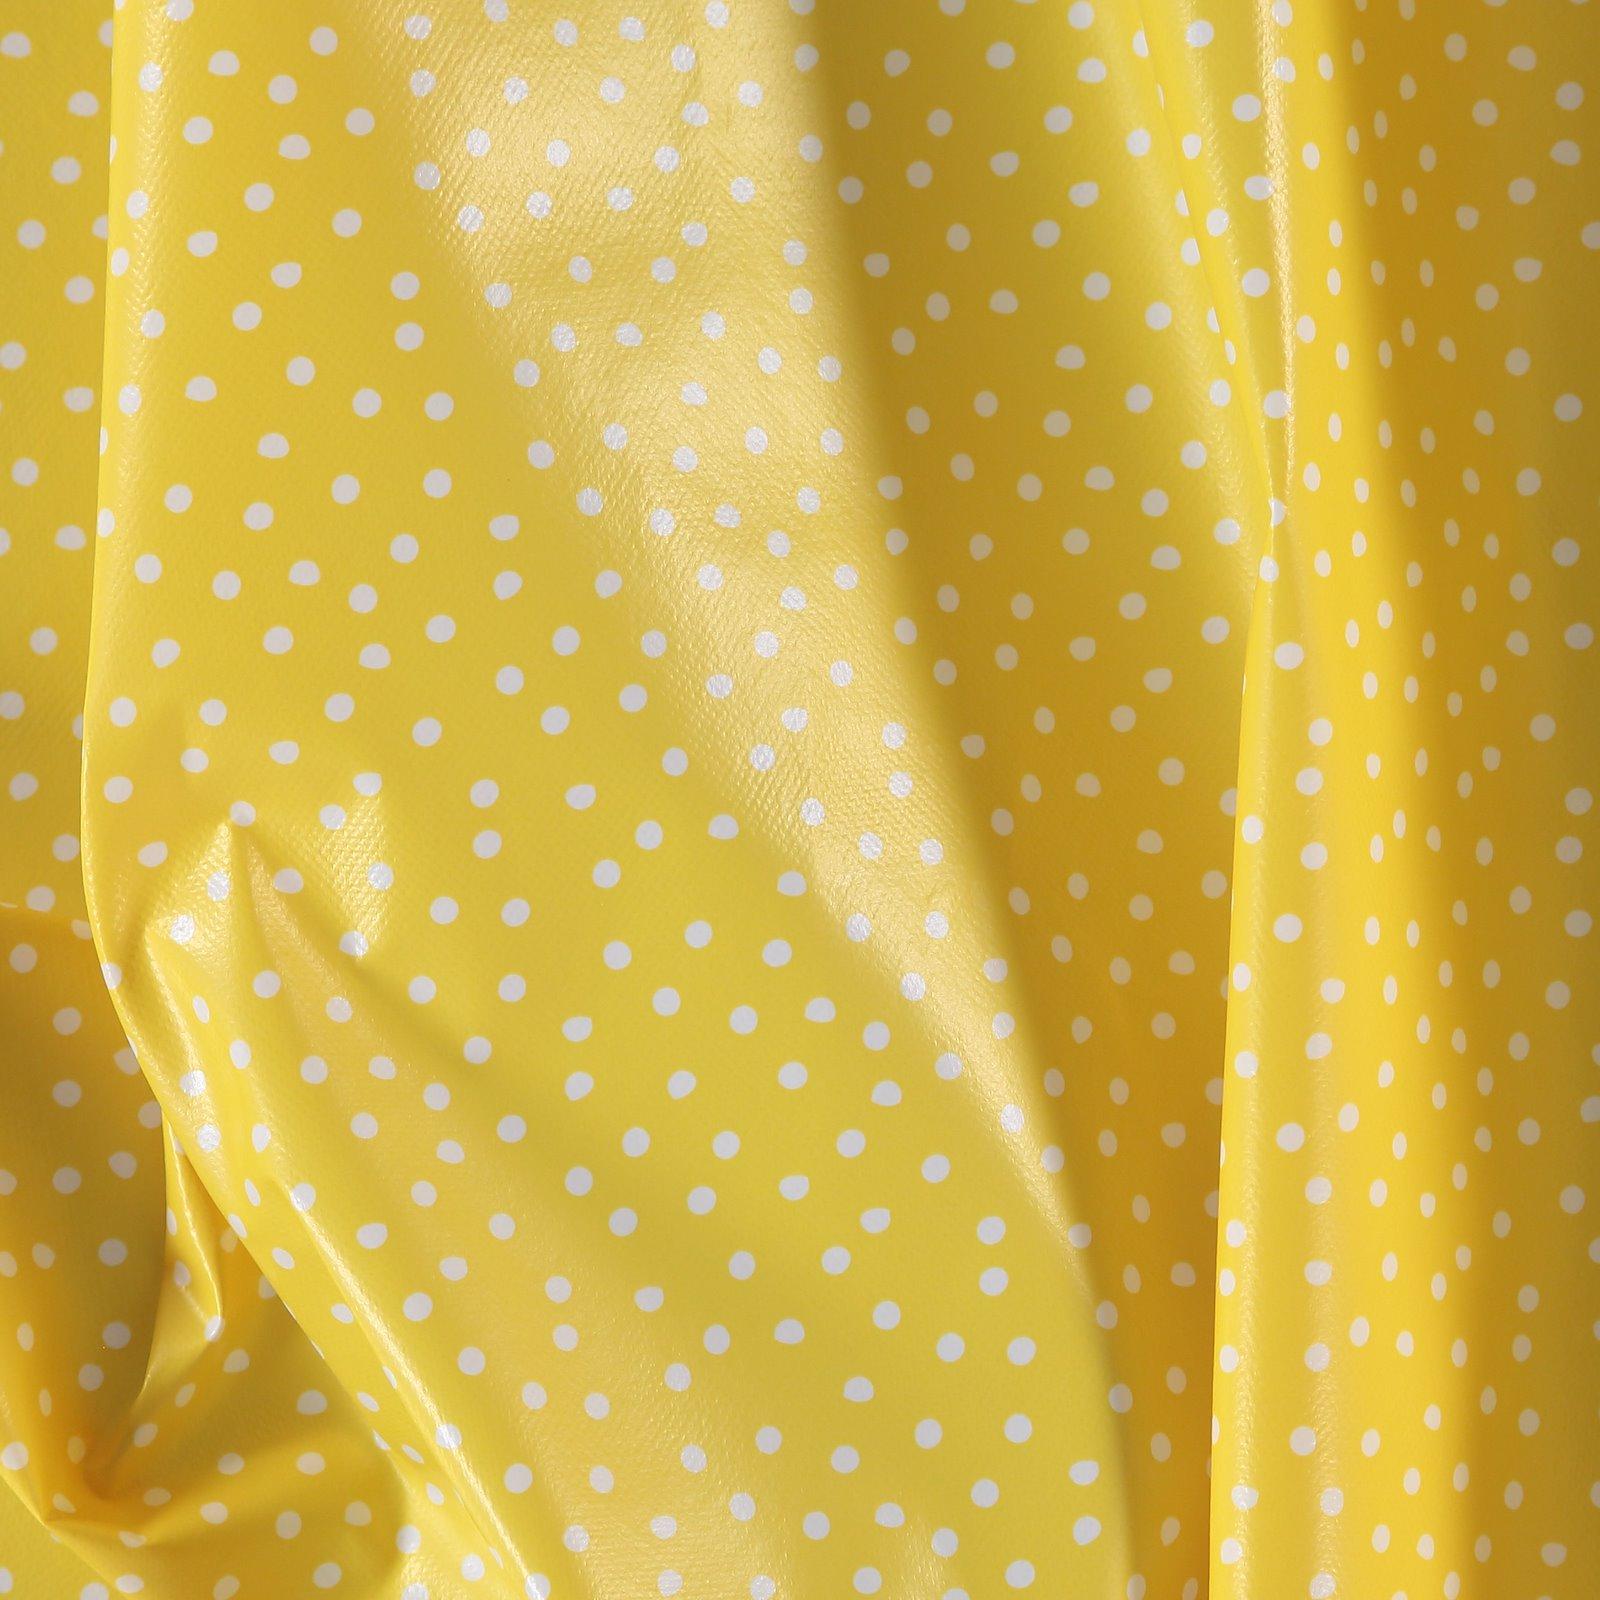 Non-woven oilcloth yellow w white dots